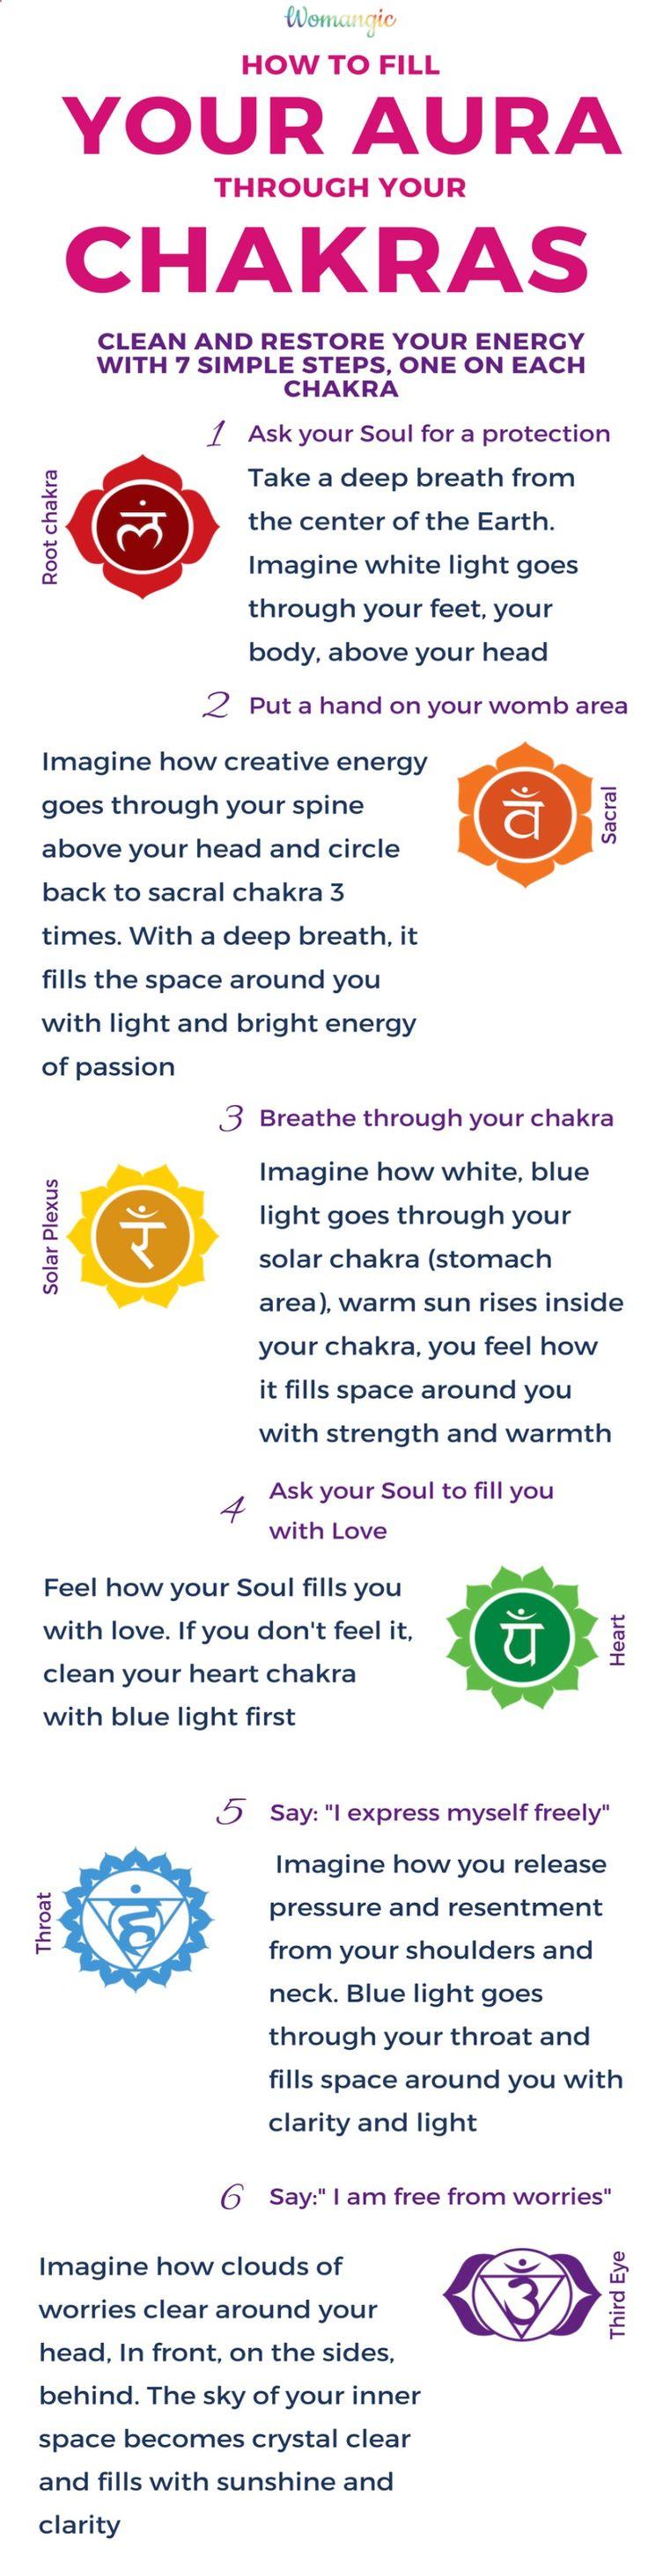 Best 25 reiki symbols meaning ideas on pinterest reiki reiki reiki symbols how to fill your aura through chakras chakra chakra balancing root sacral solar plexus heart throat third eye crown chakra meaning biocorpaavc